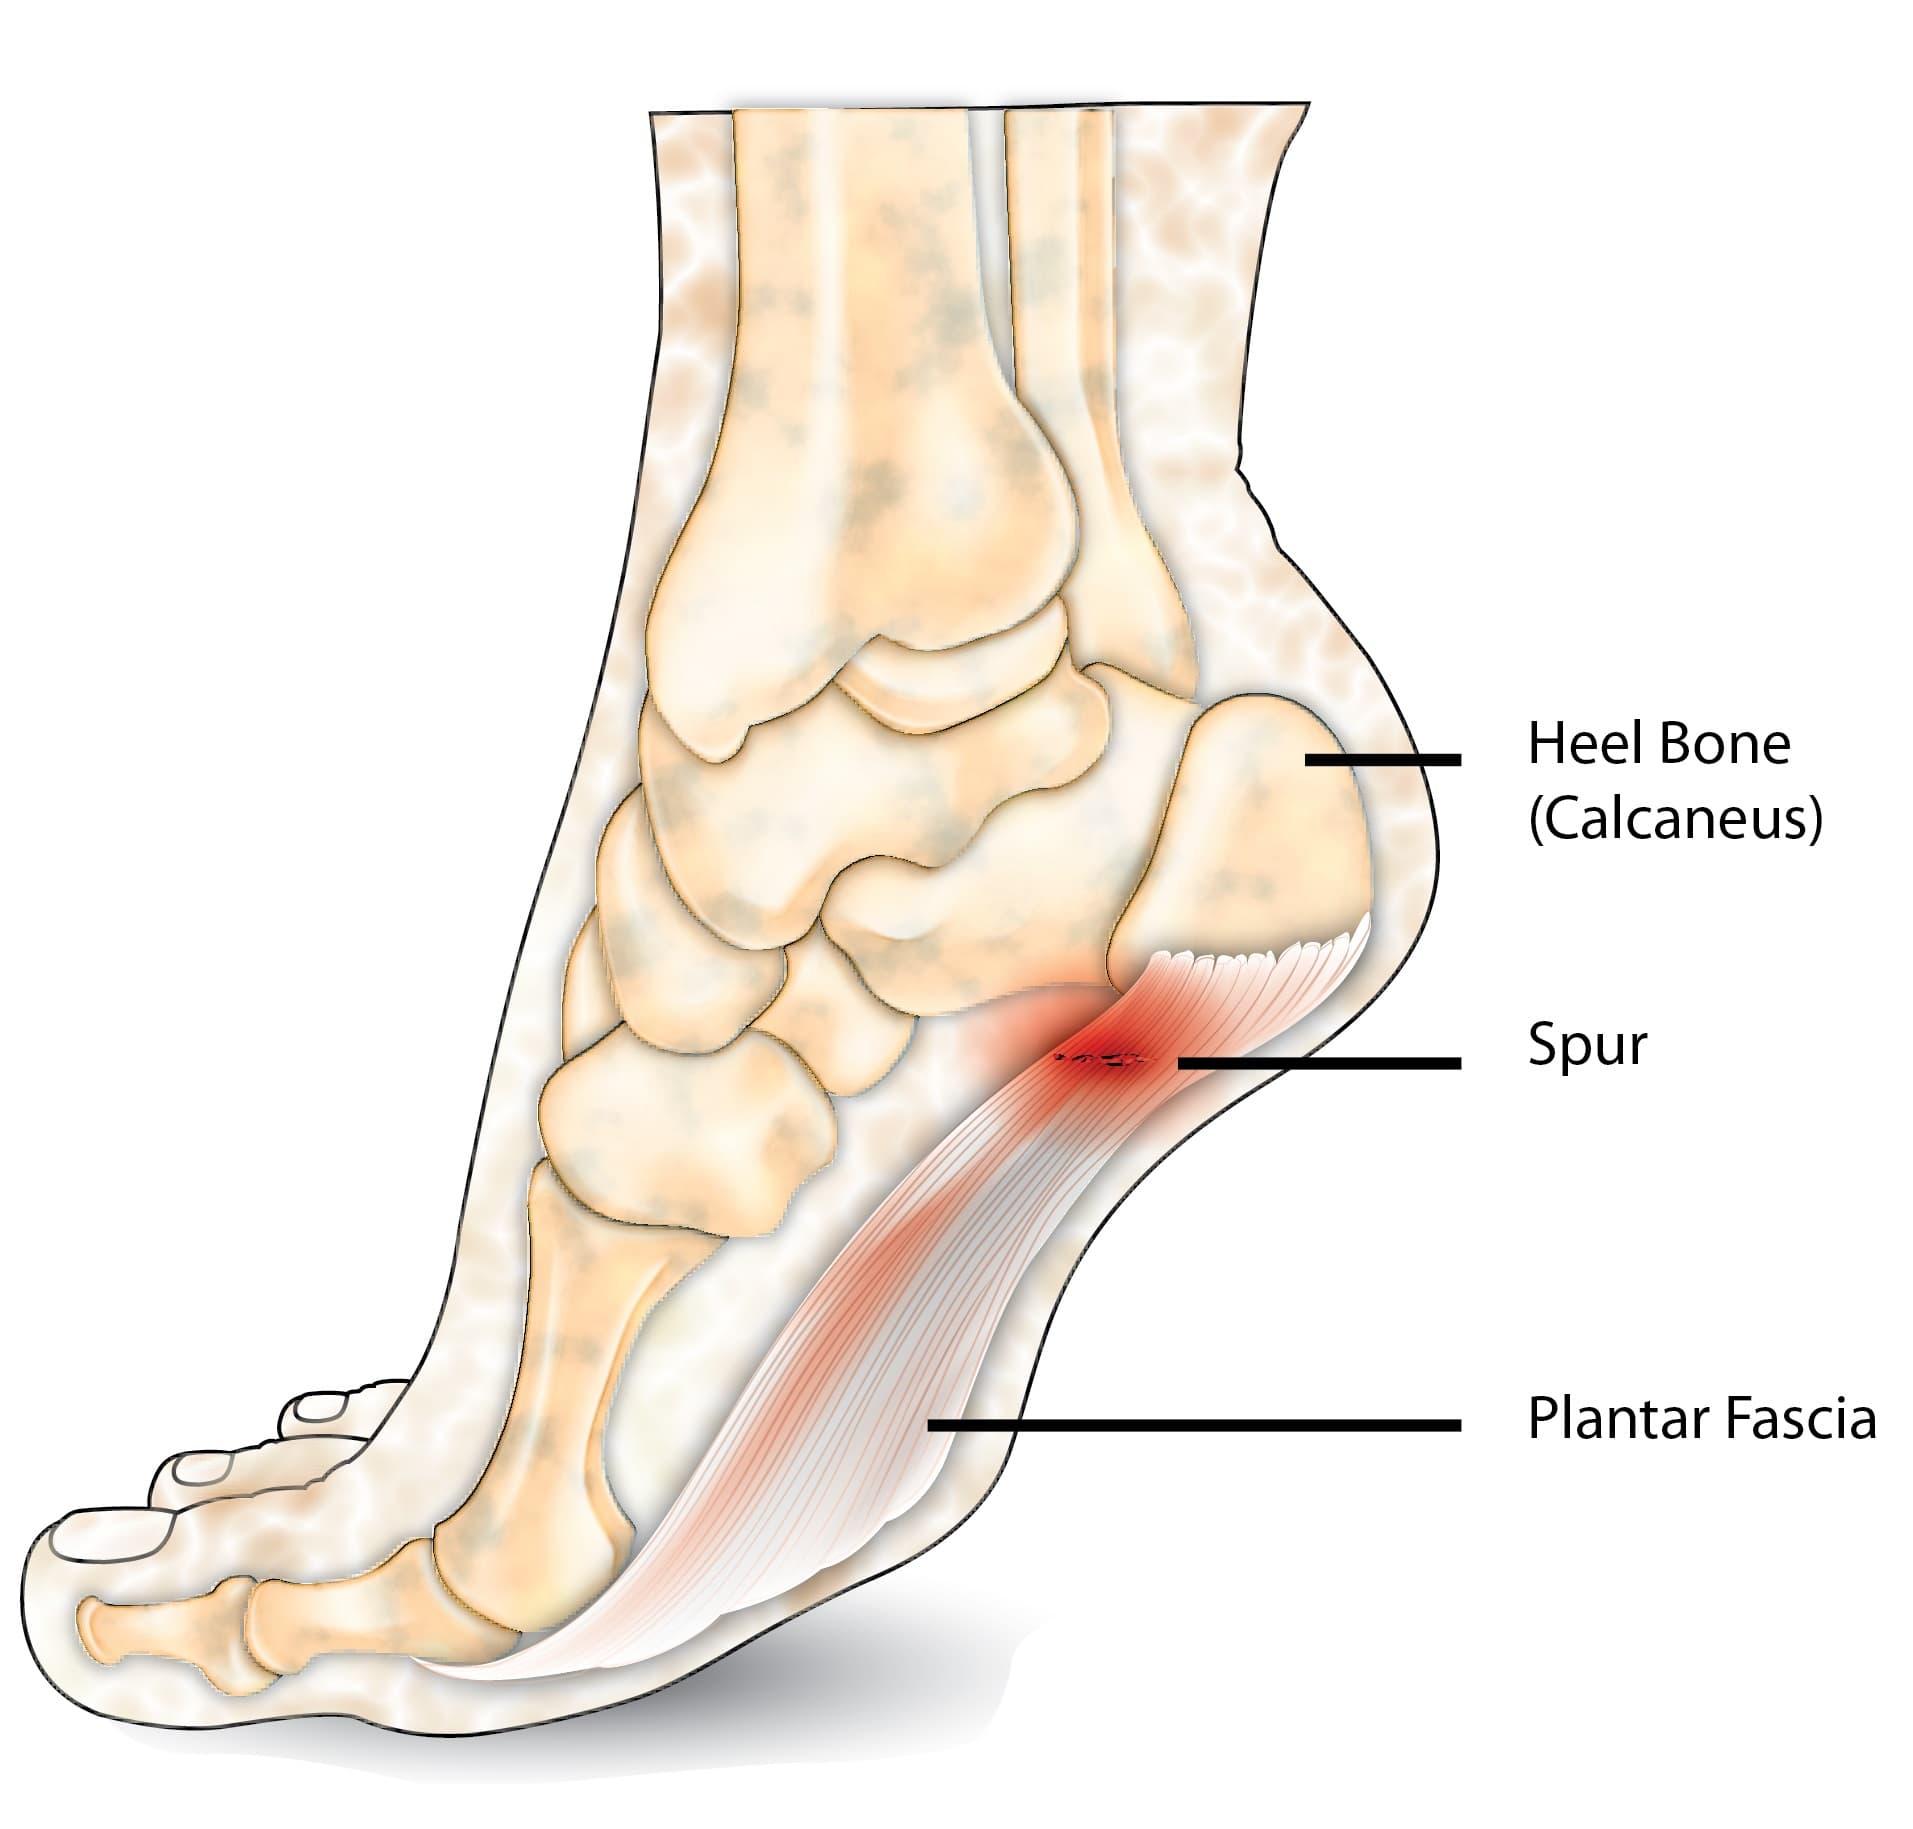 heel spur injury